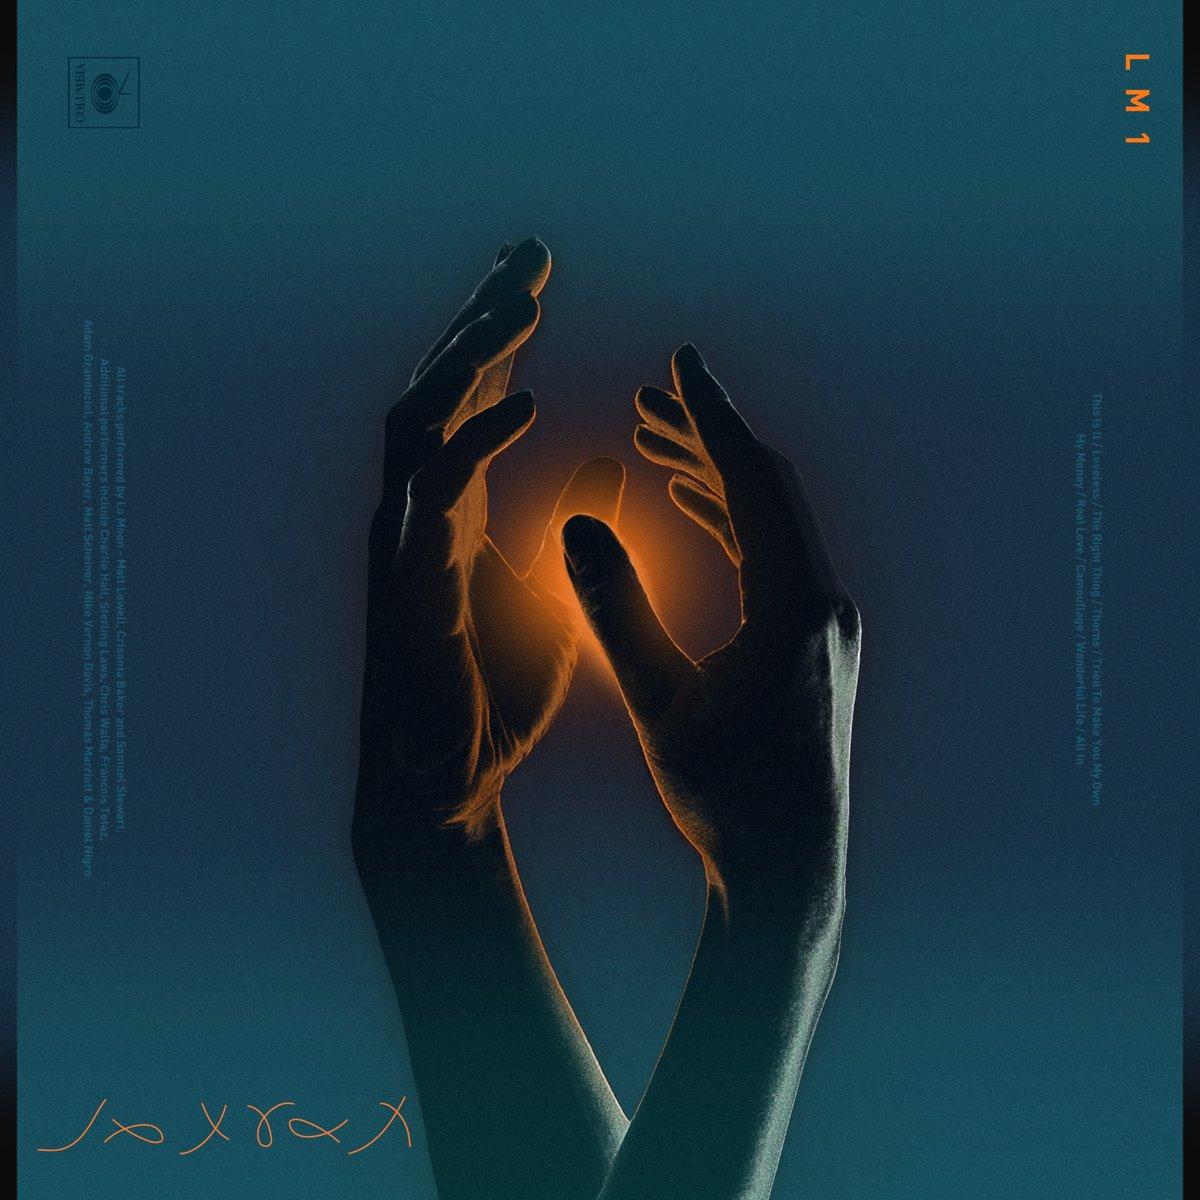 Lo Moon: Album Review